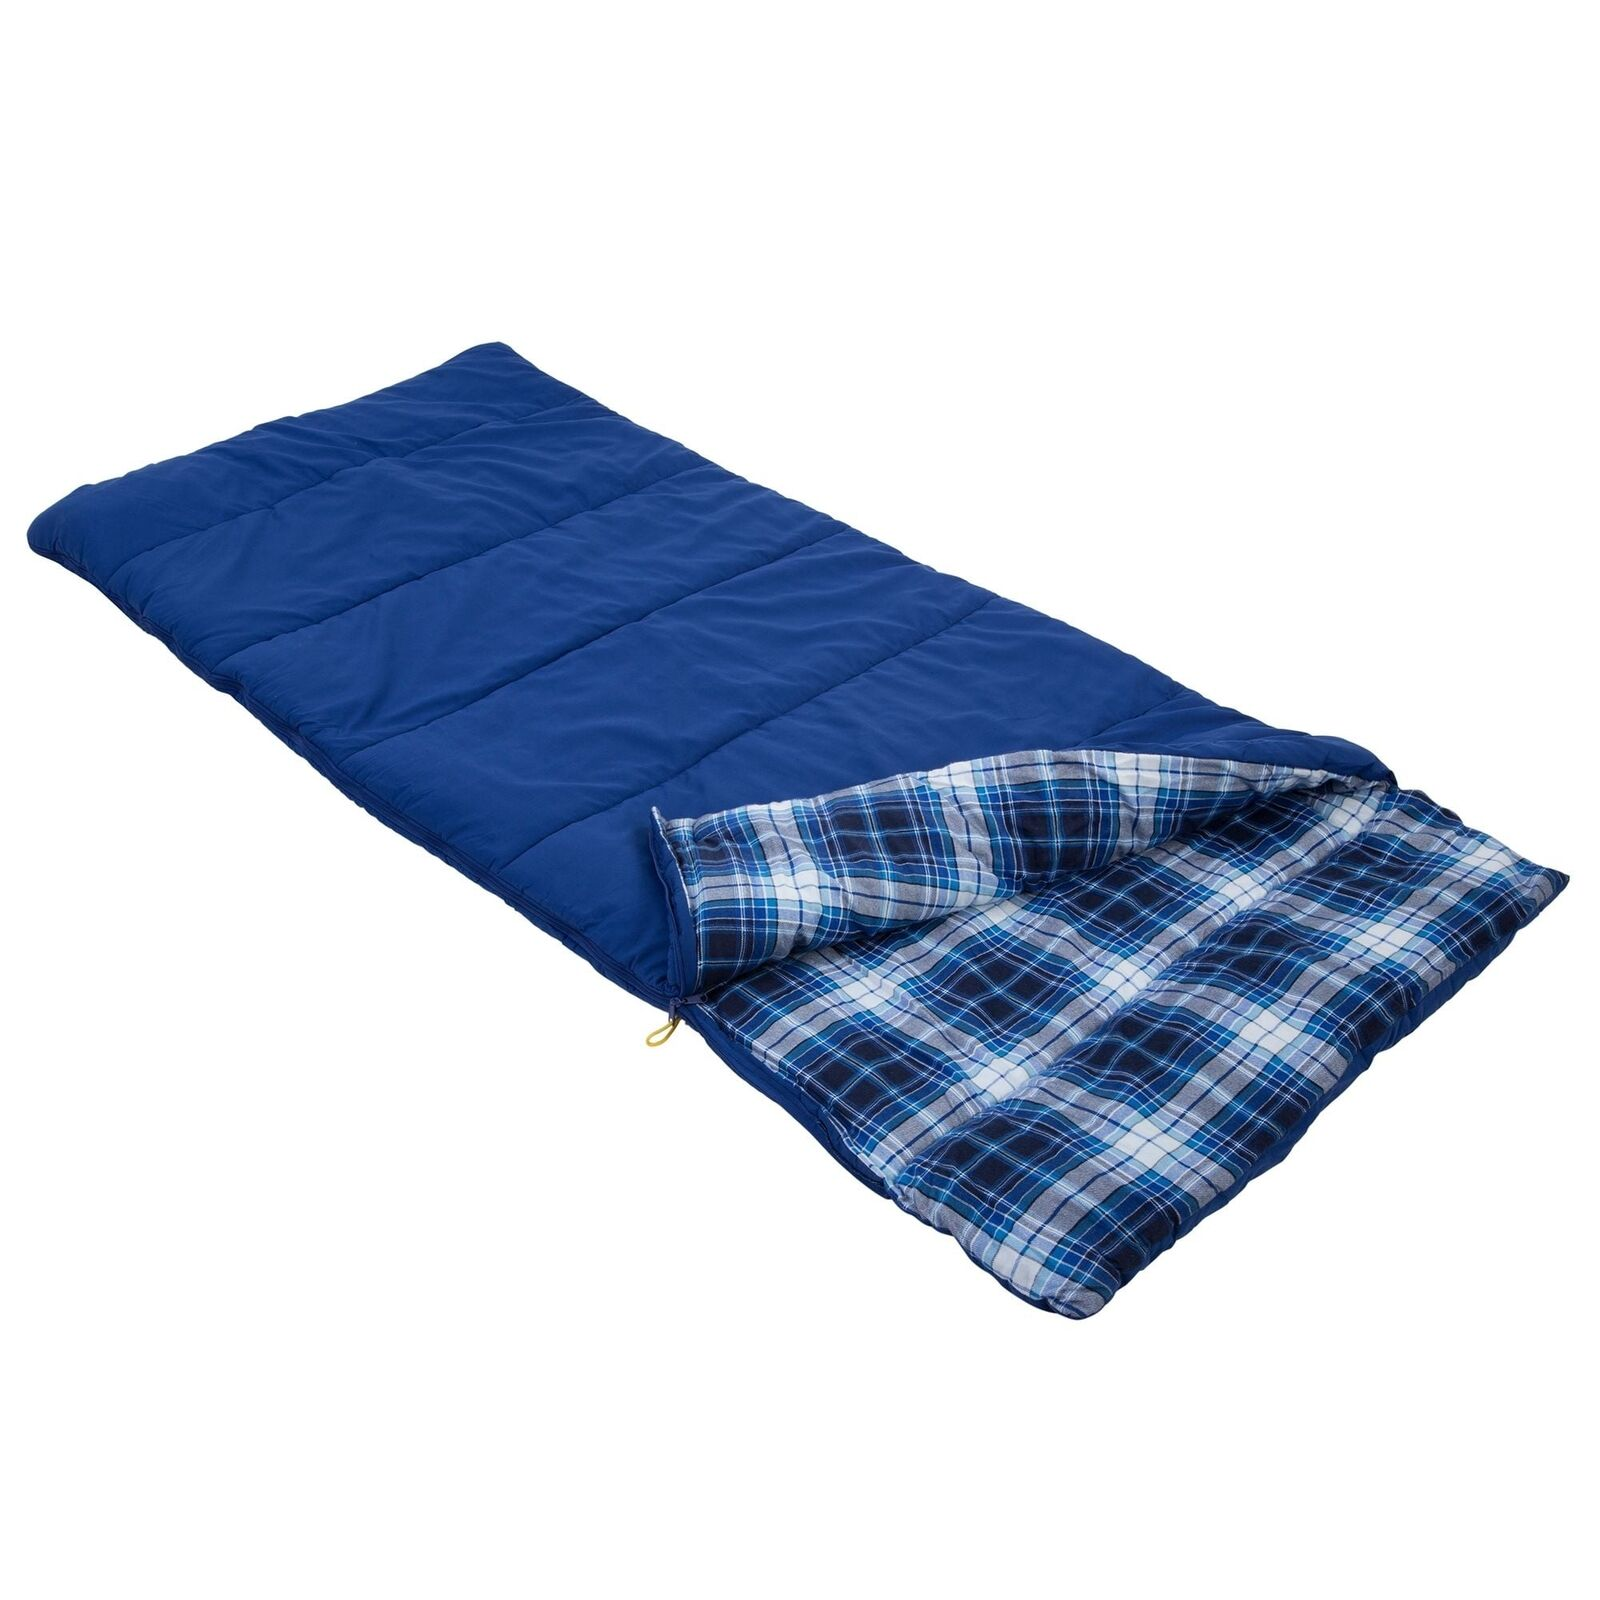 Regatta Bienna  Single Sleeping Bag  cheap sale